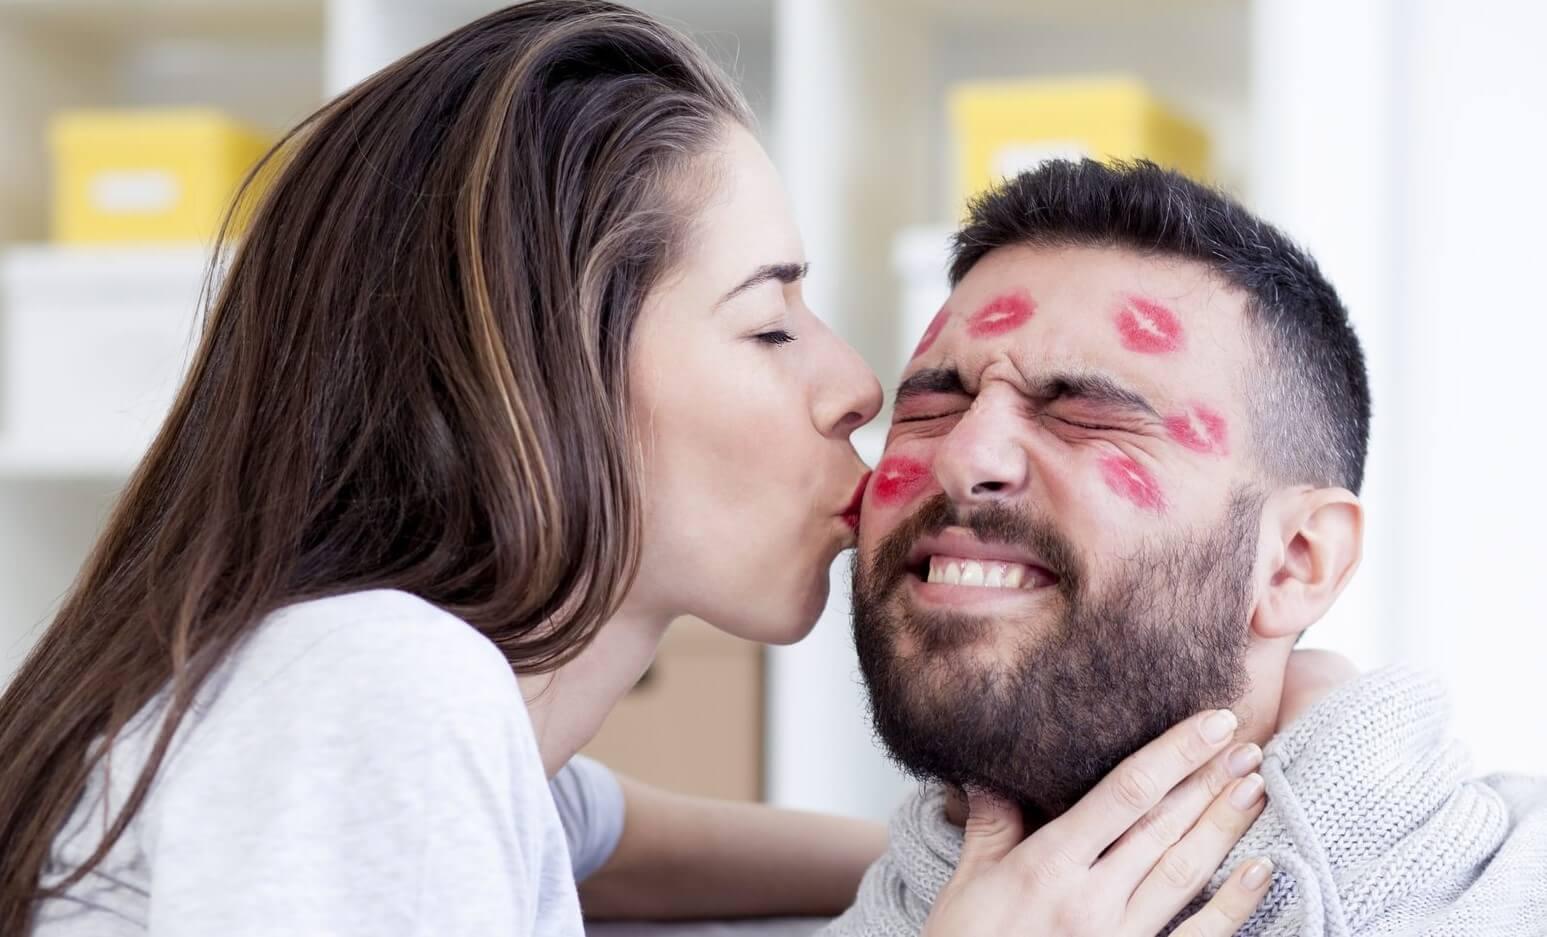 Sonhar Beijando